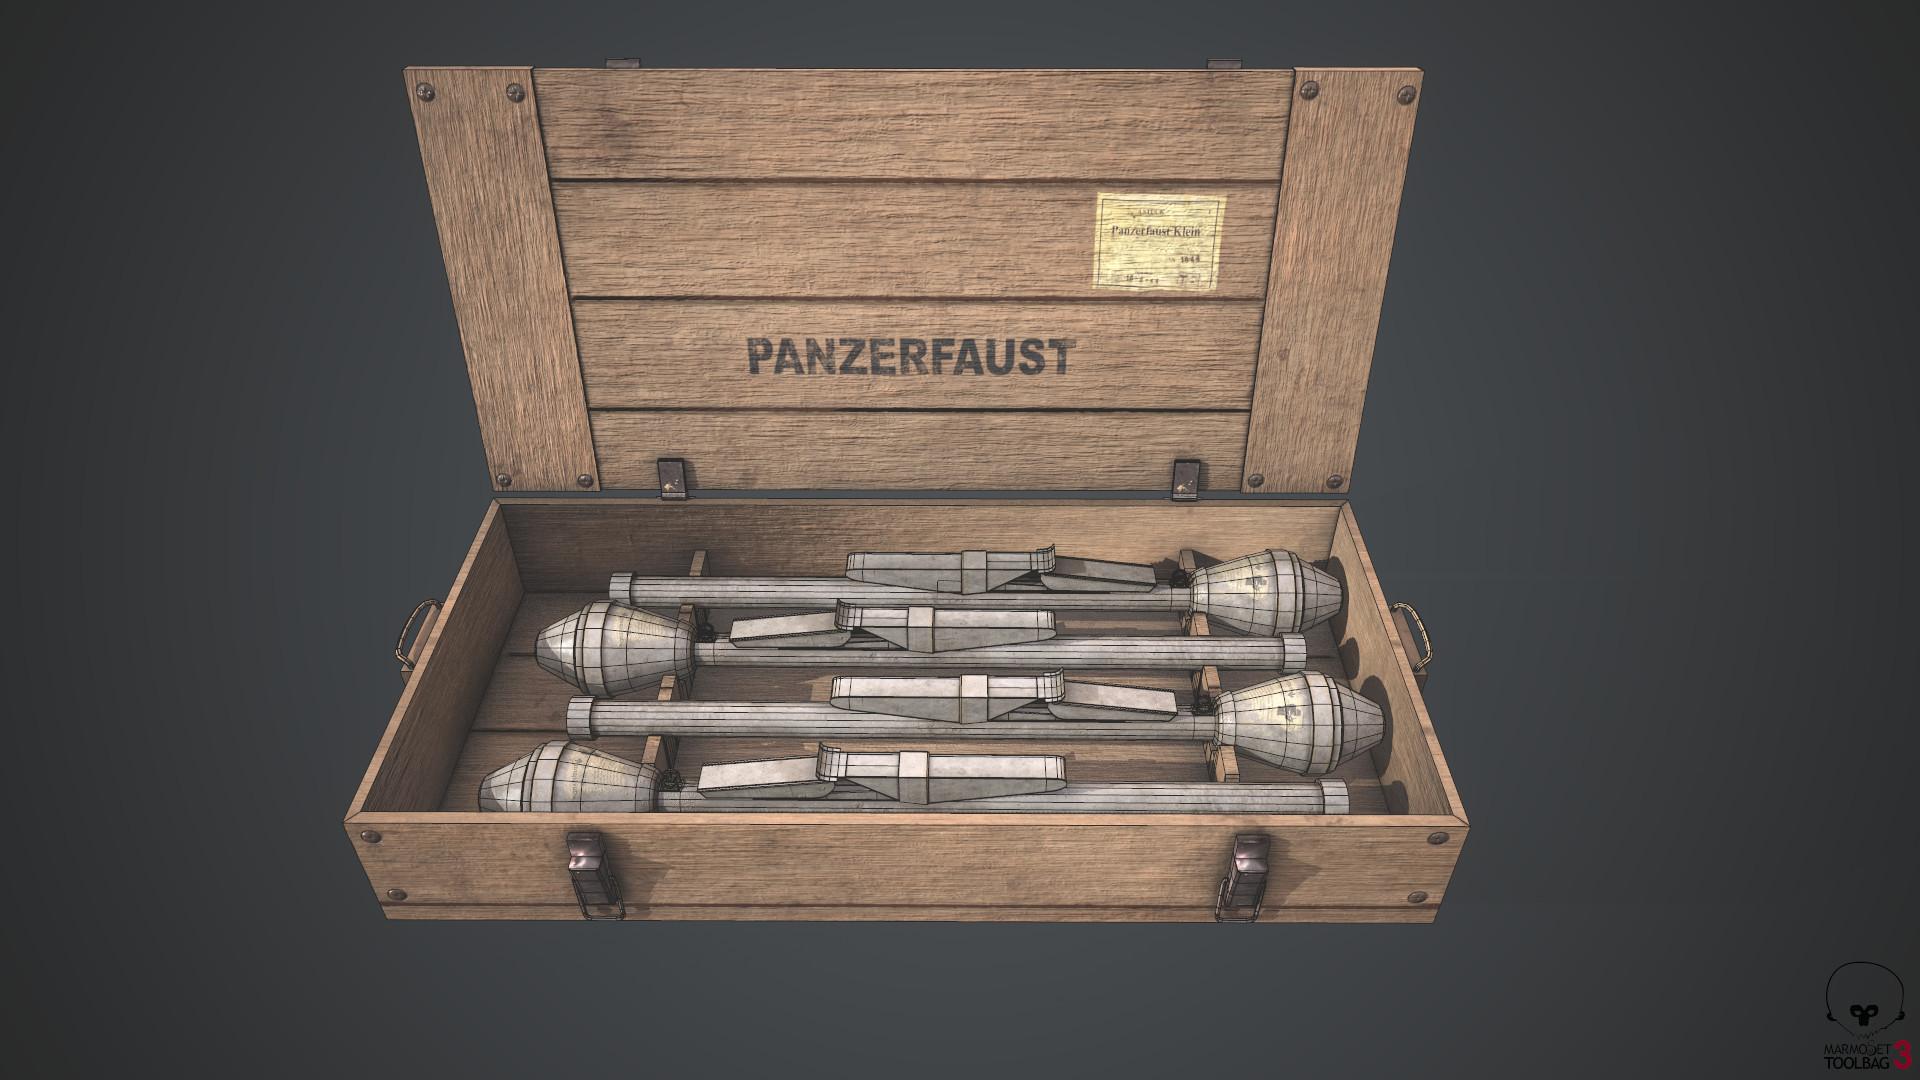 Serdar cendik panzerfaustboxwireframe